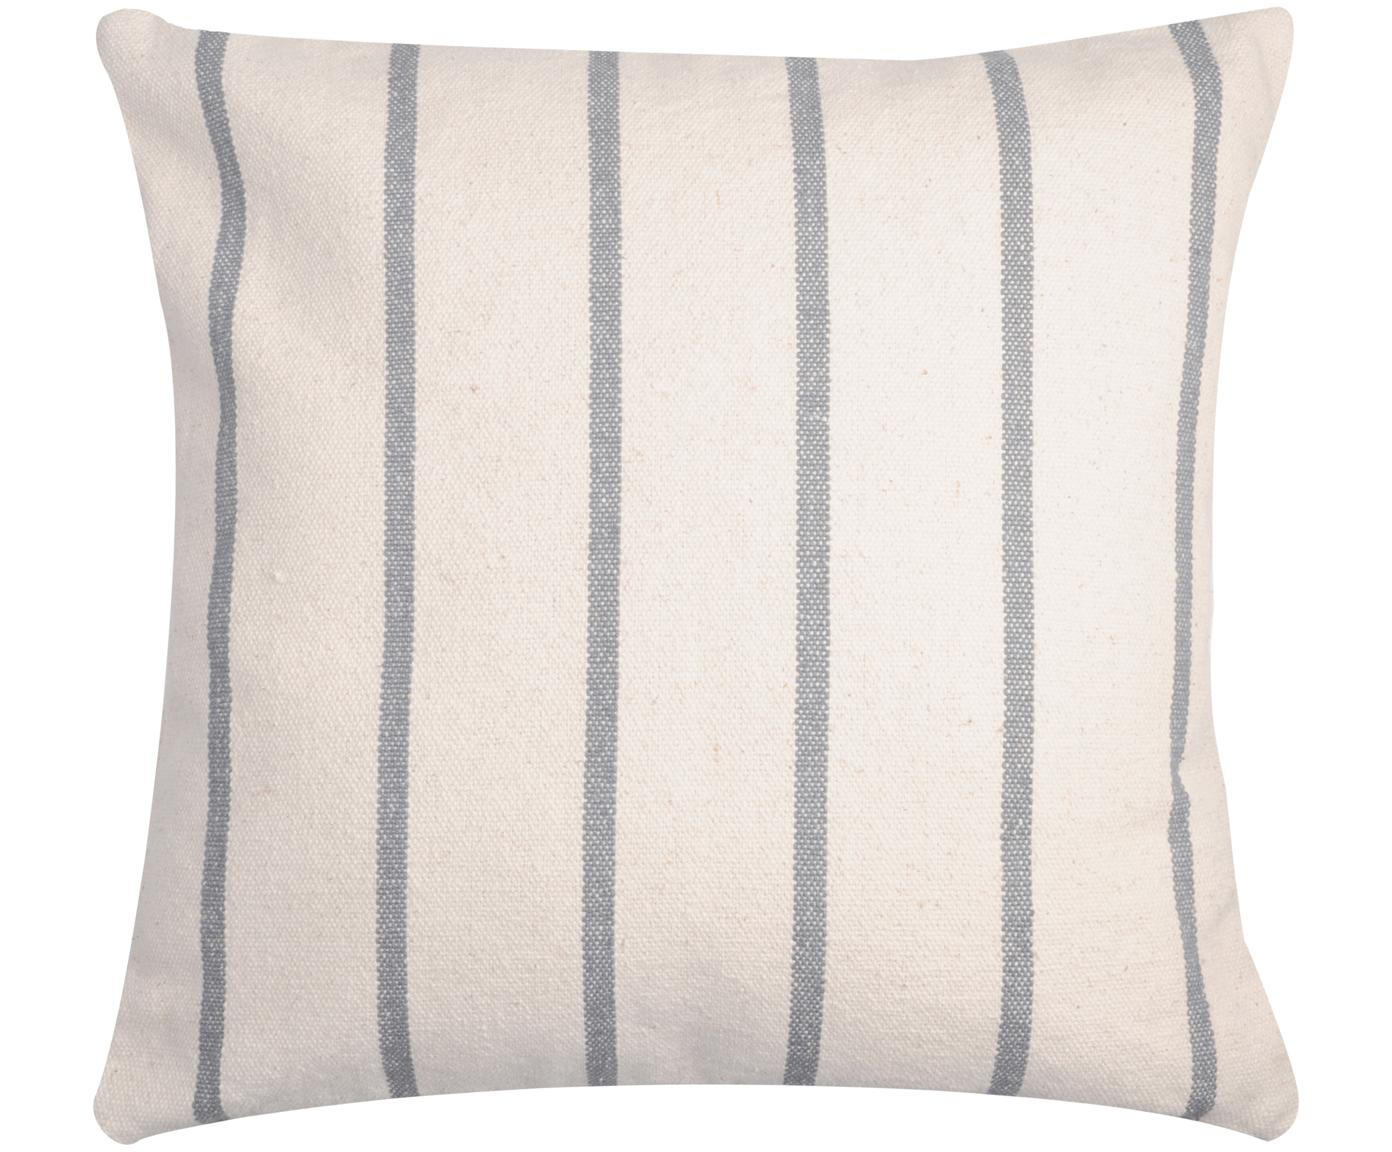 Cojín Pampelonne, con relleno, Tapizado: 100%algodón, Gris antracita, blanco crudo, An 50 x L 50 cm